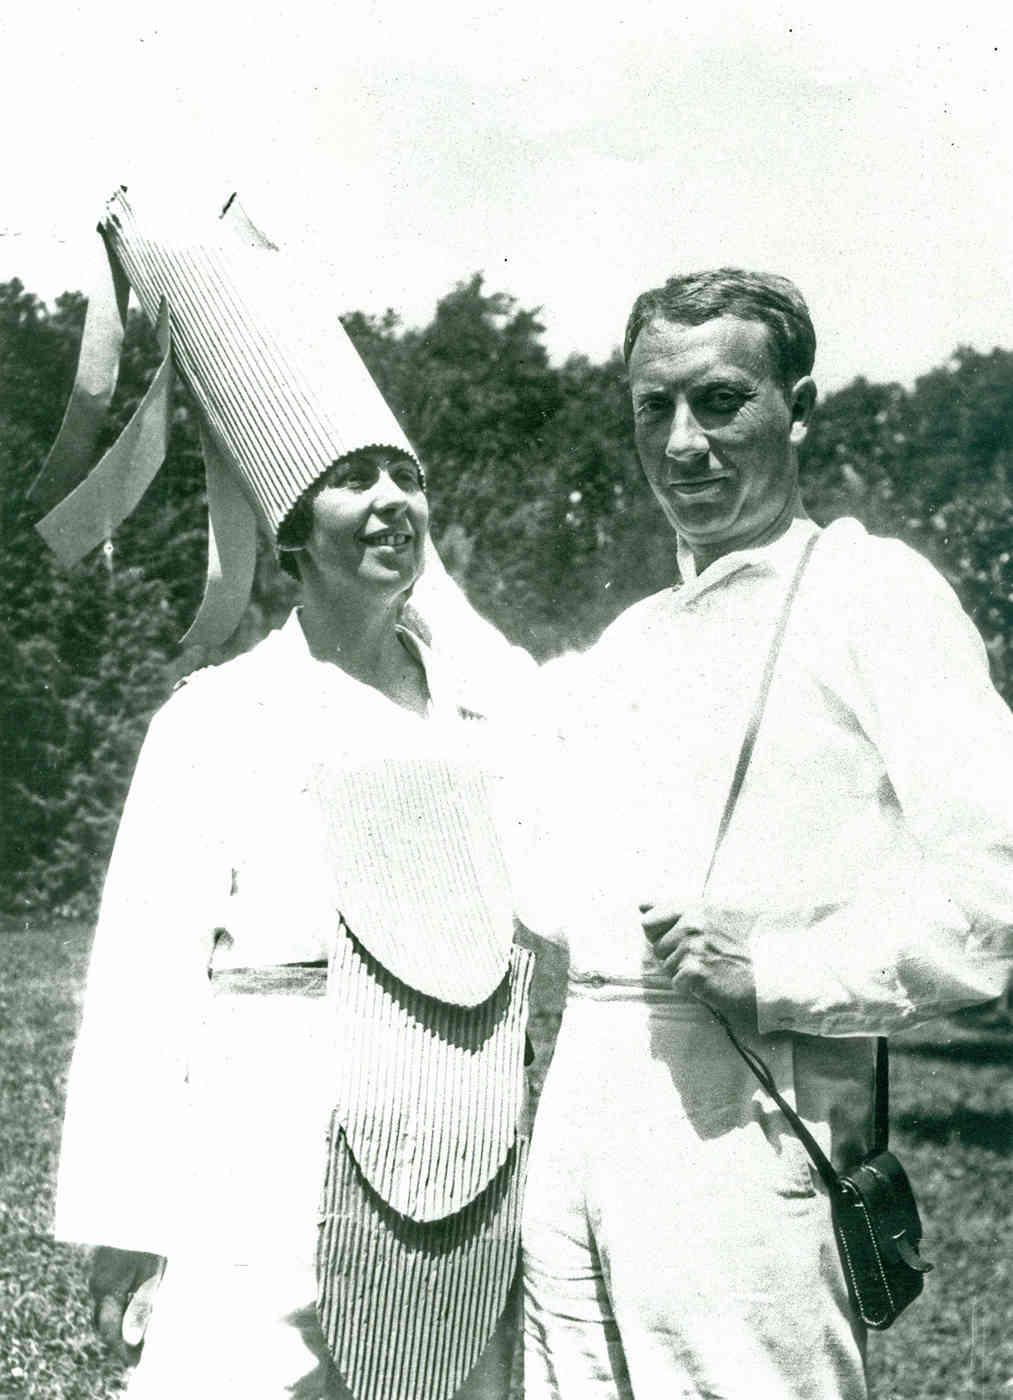 Sophie Taeuber-Arp and Hans Arp in Ascona, 1925